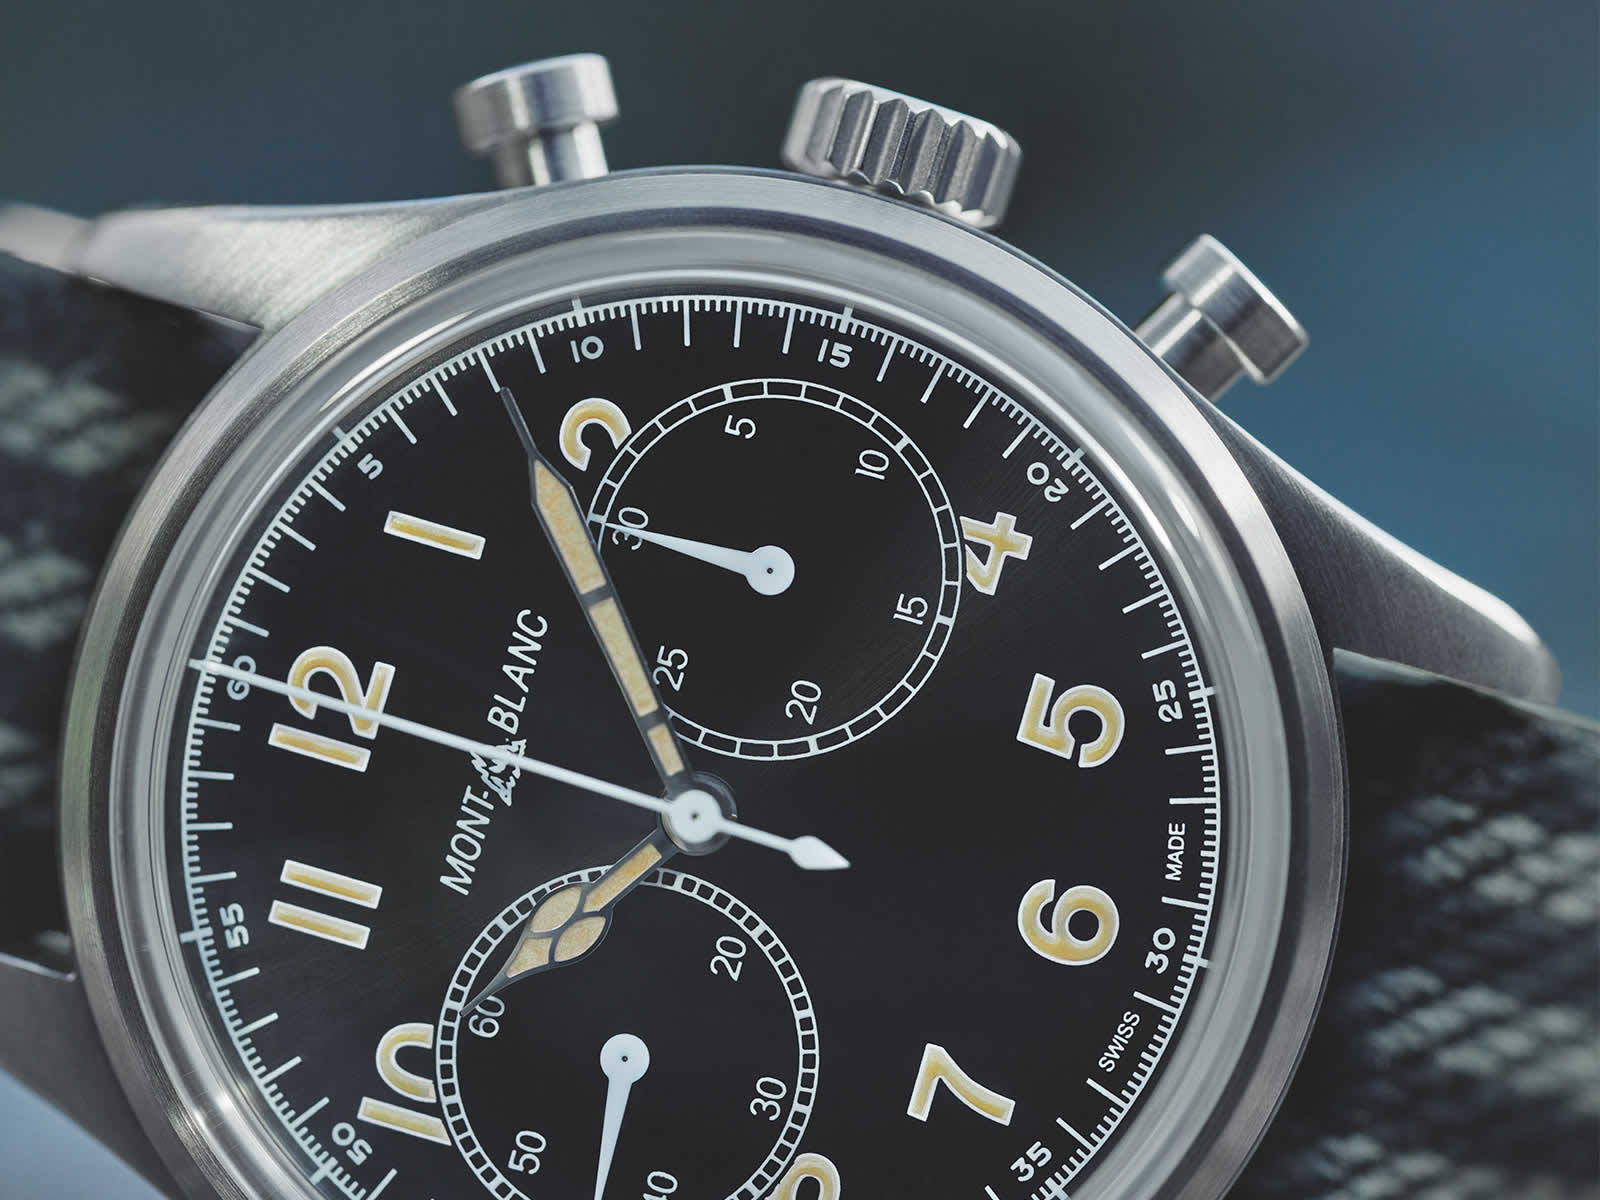 1858-Automatic-Chronograph-117835-4.jpg